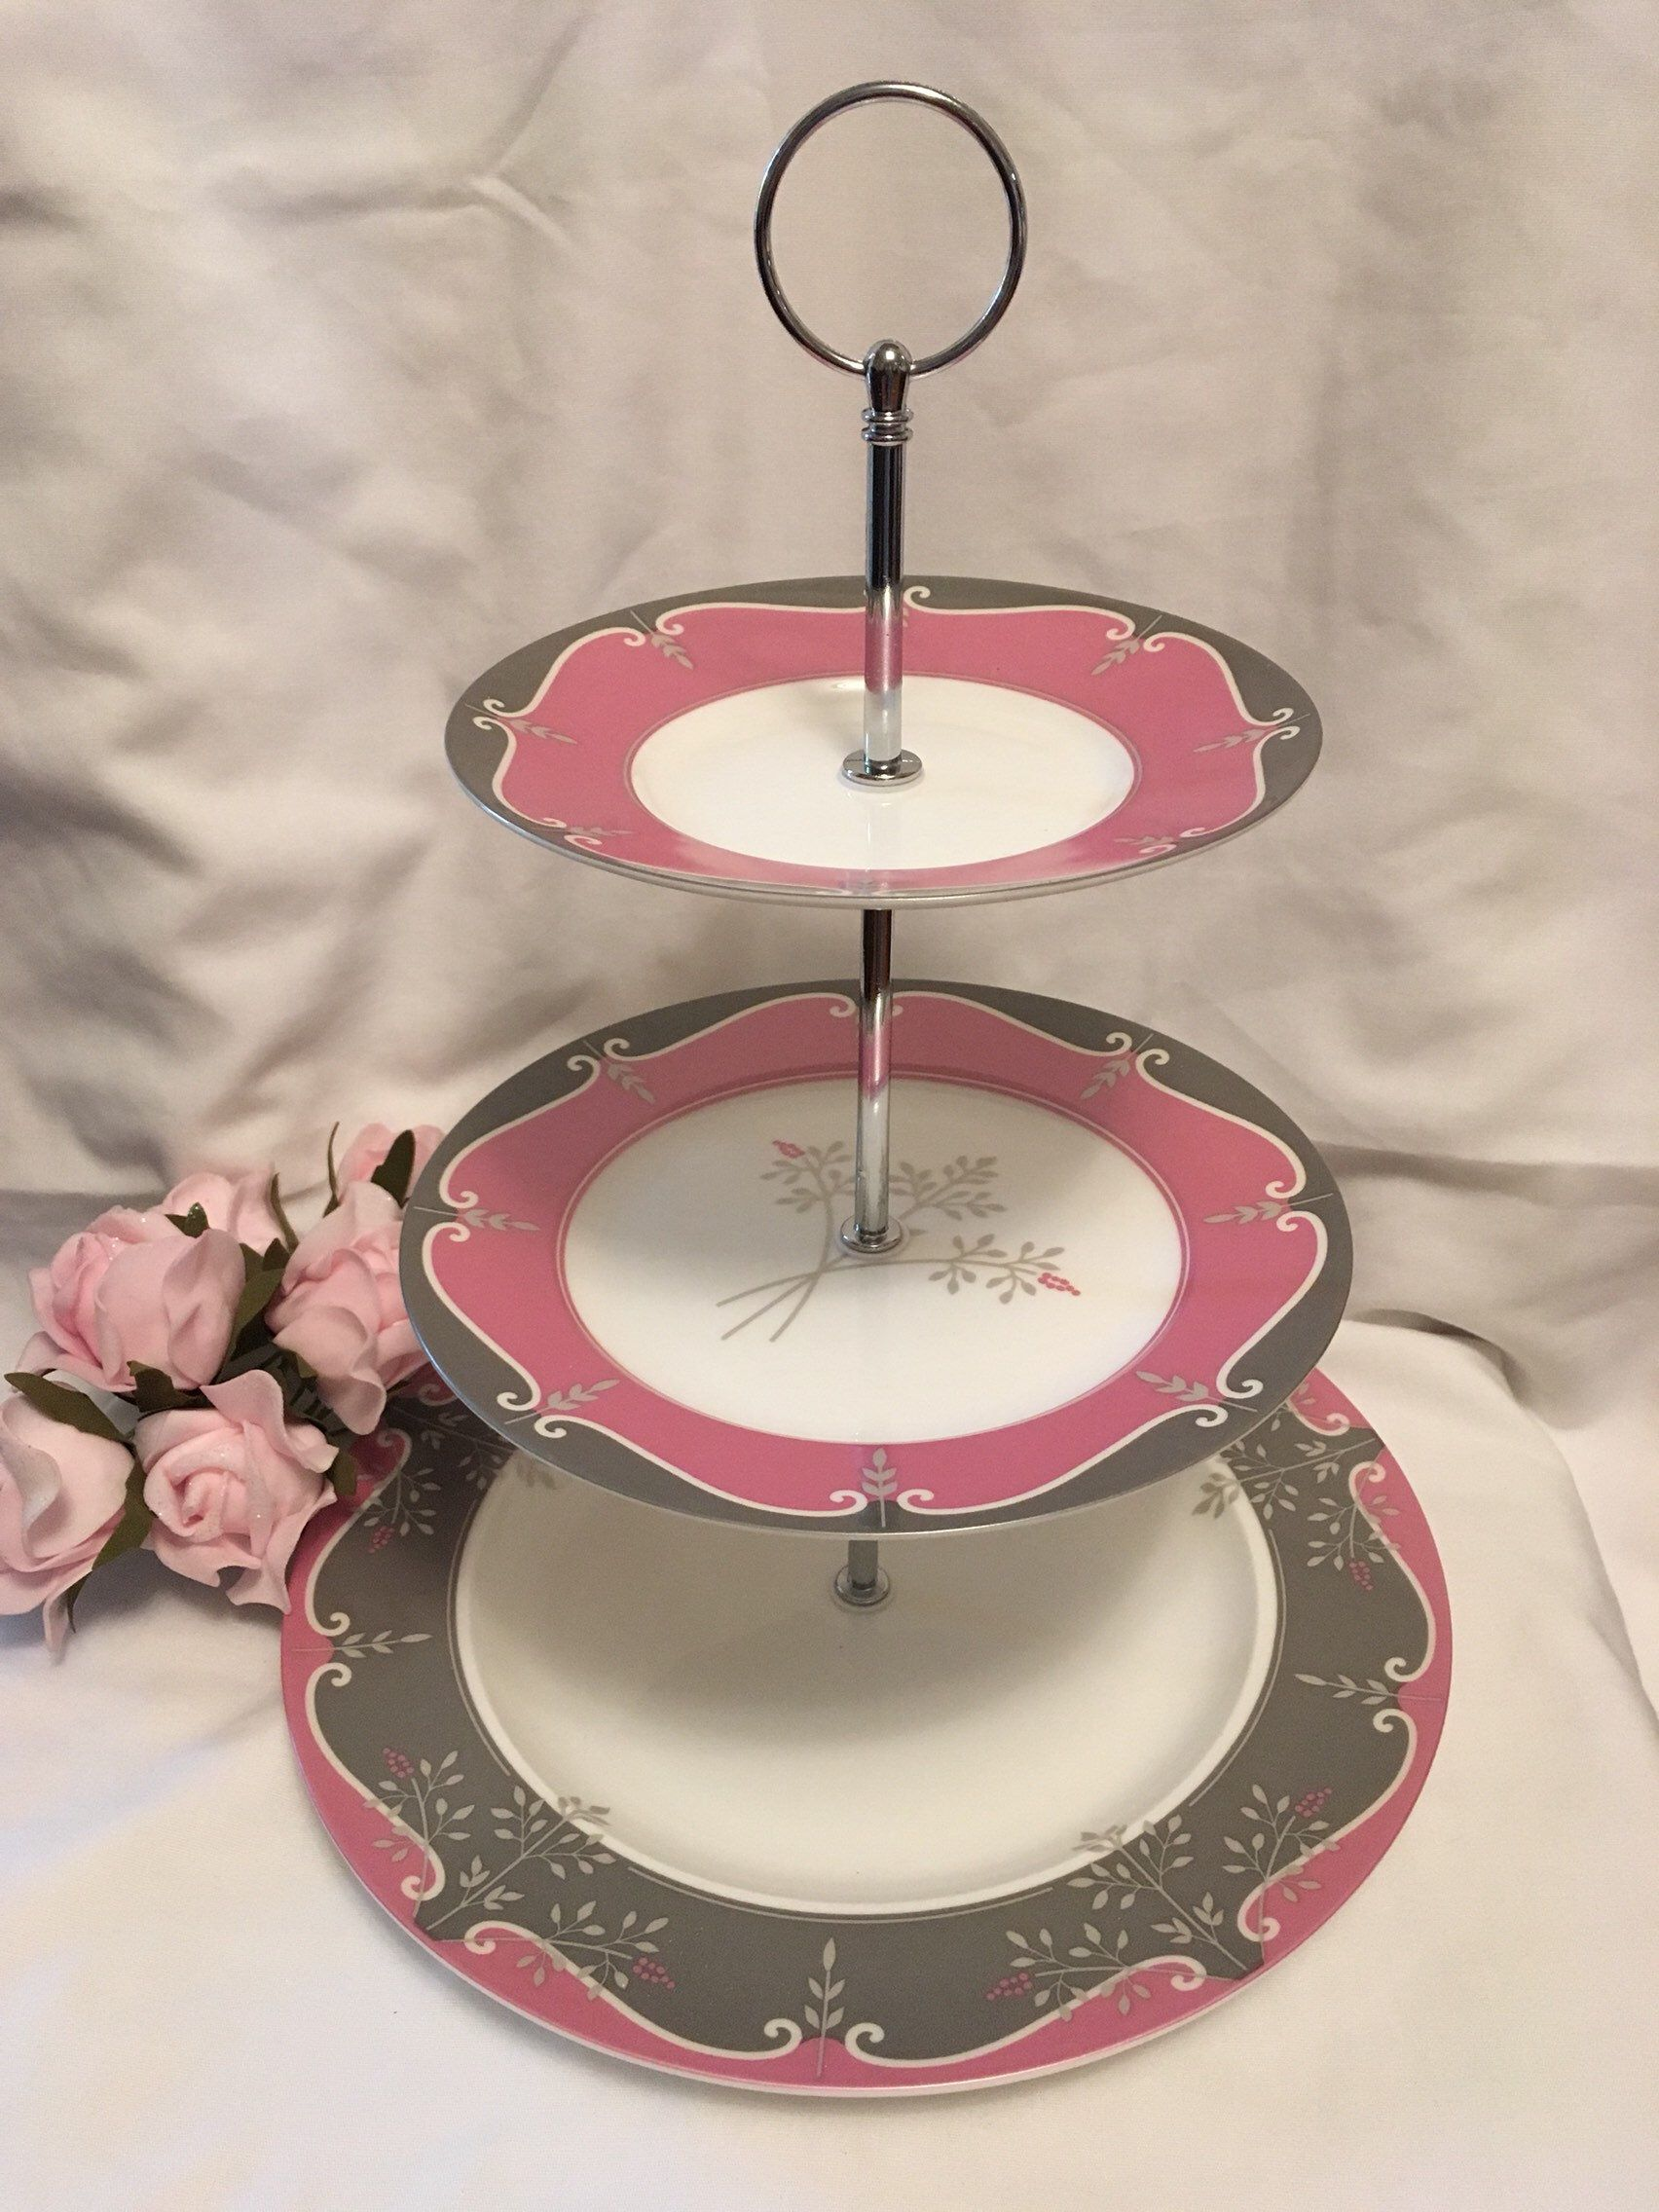 3 tier cake stand - asda